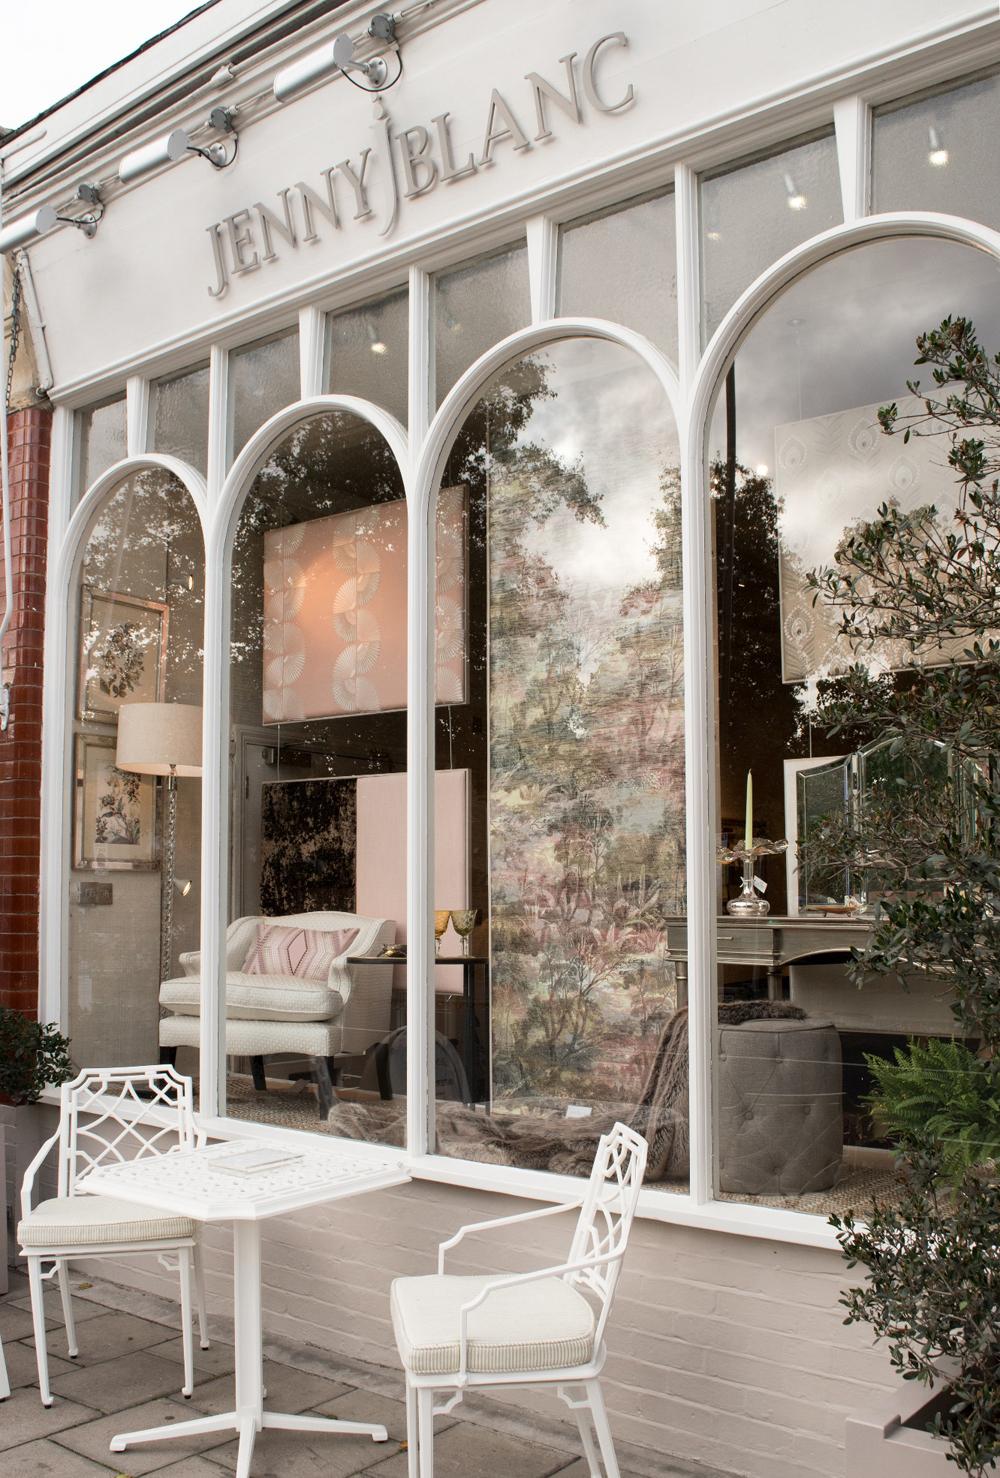 Jenny Blanc London Showroom Window Display